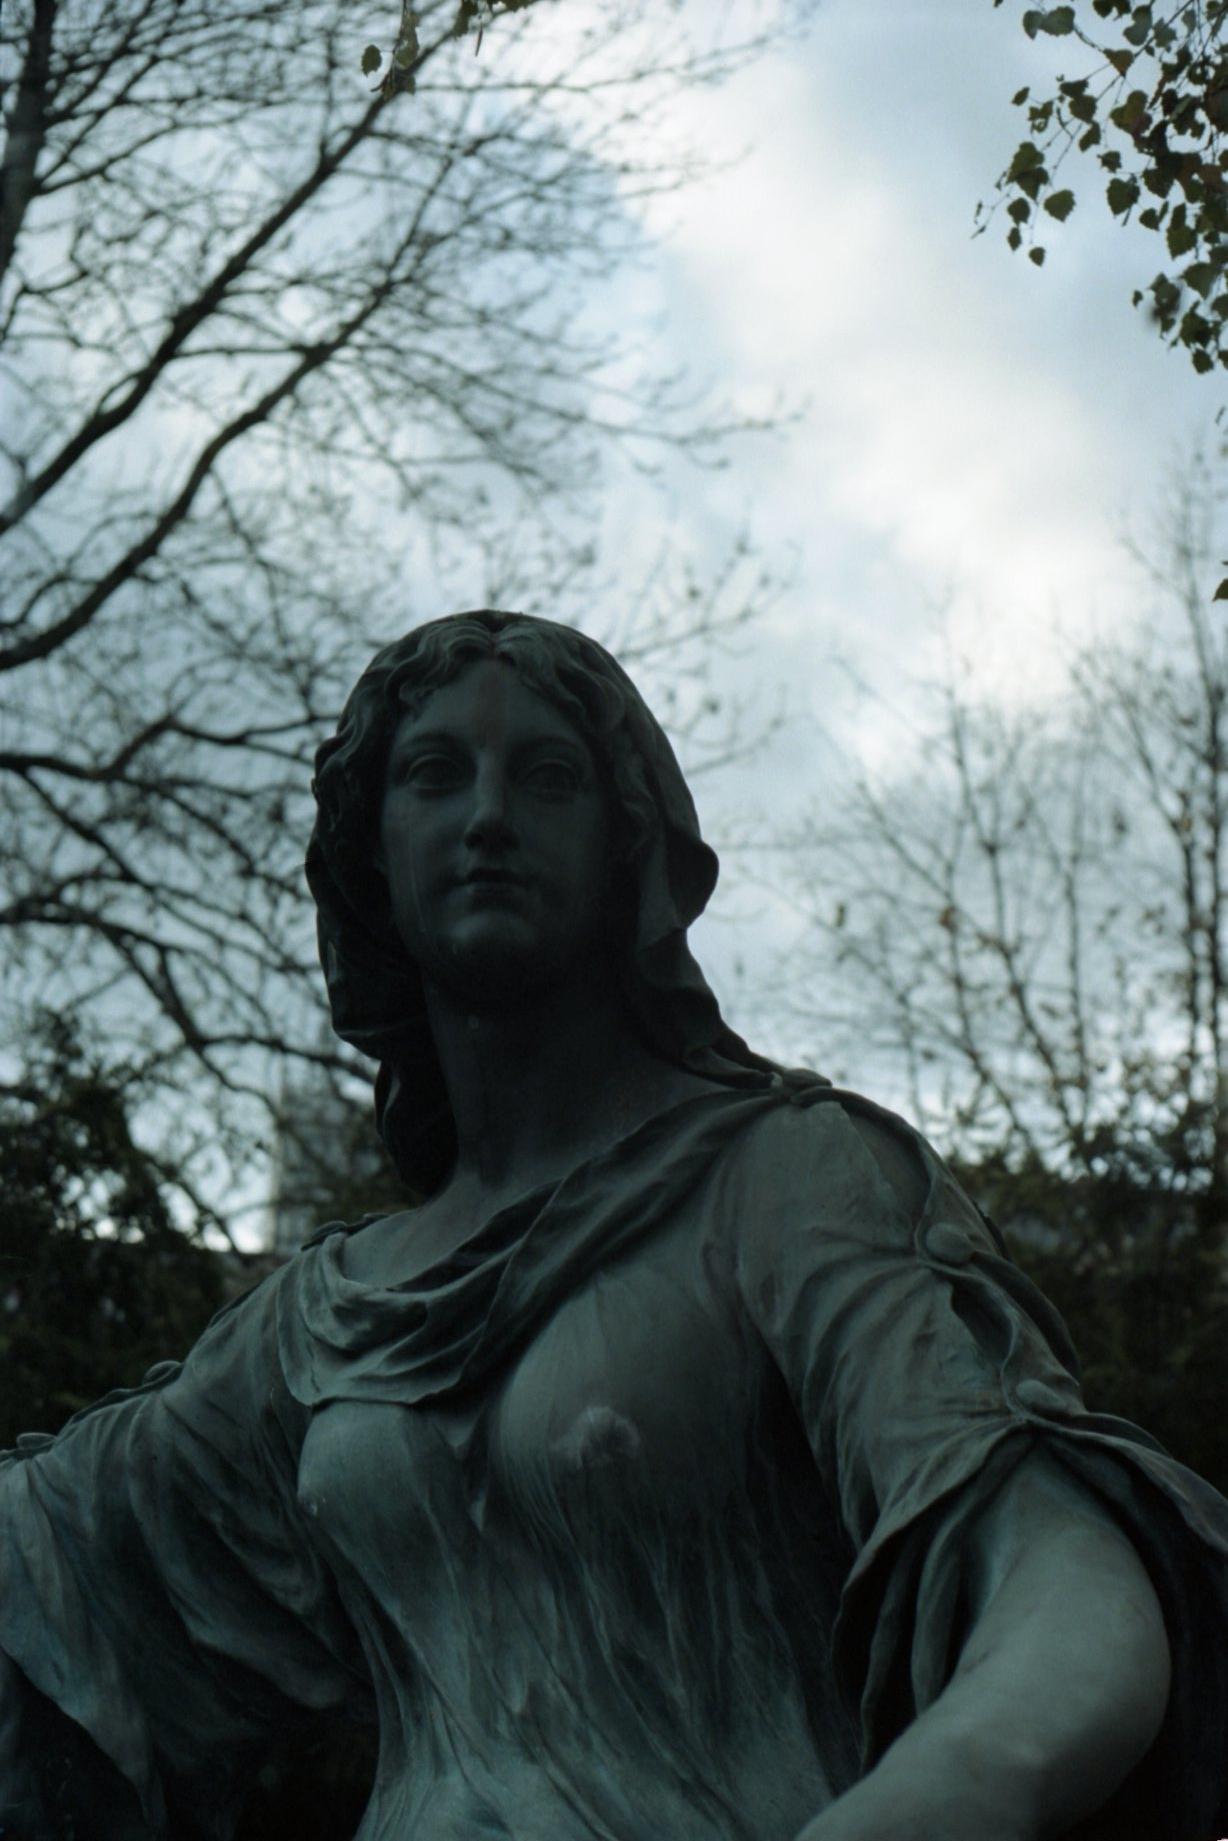 Zorki 4 + Industar-61 L/D - Personification of Tolerance (bronze statue)